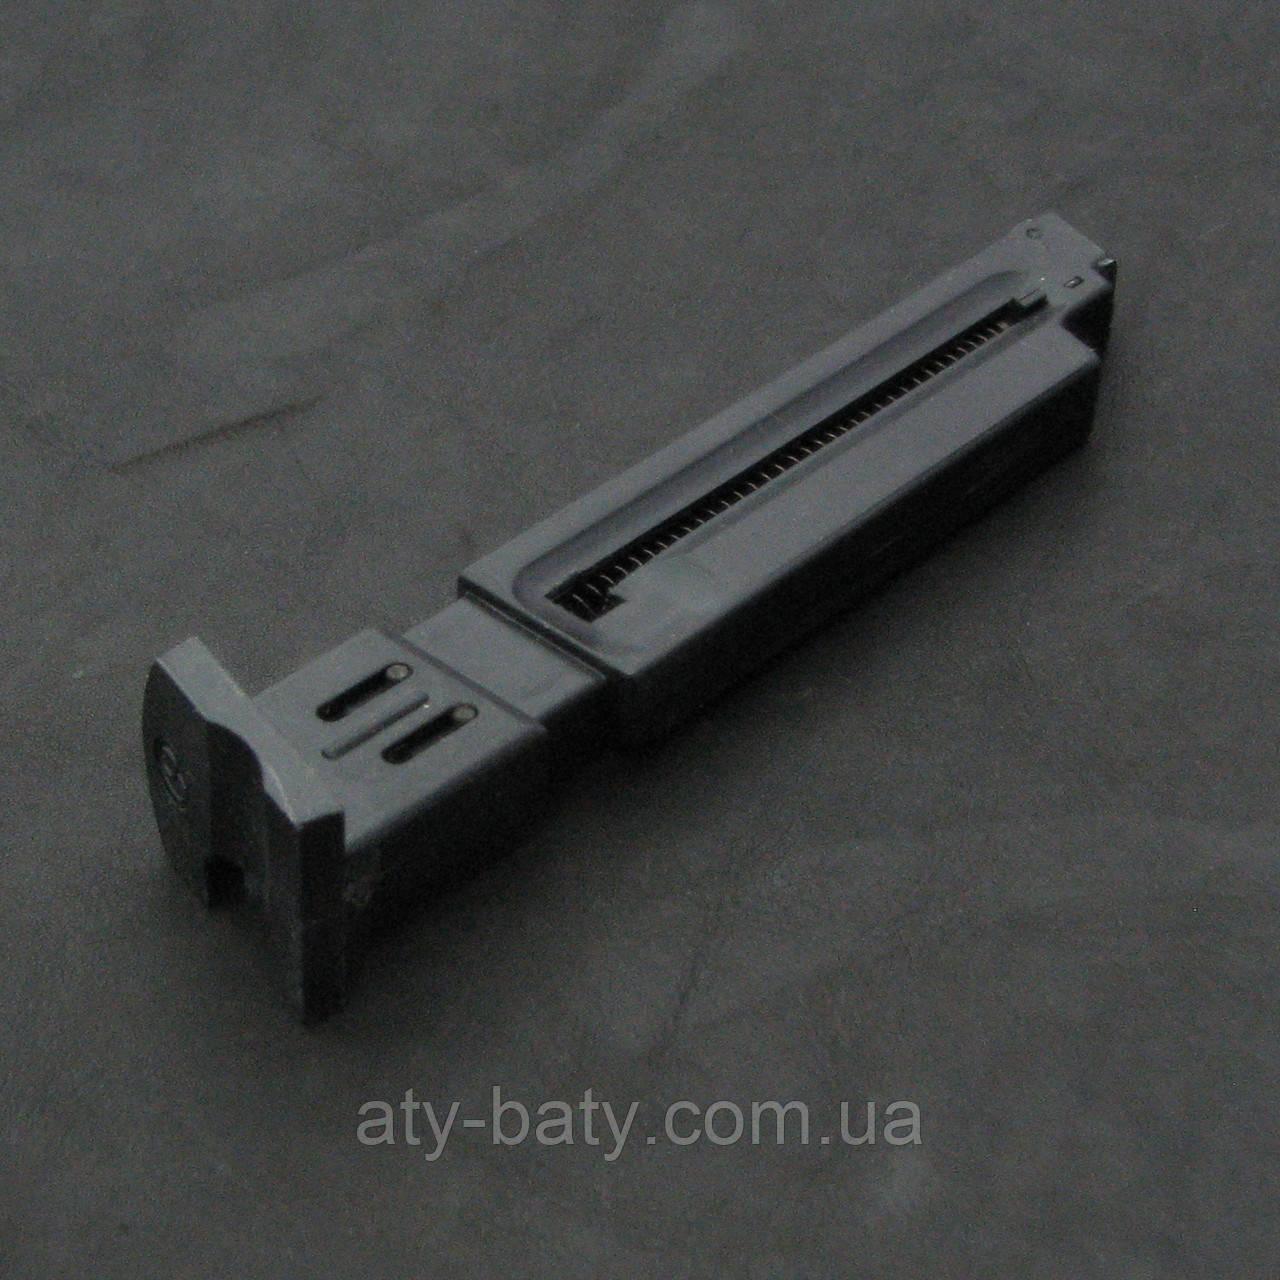 Магазин для пневматического пистолета Аникс А-101, А-111, А-112